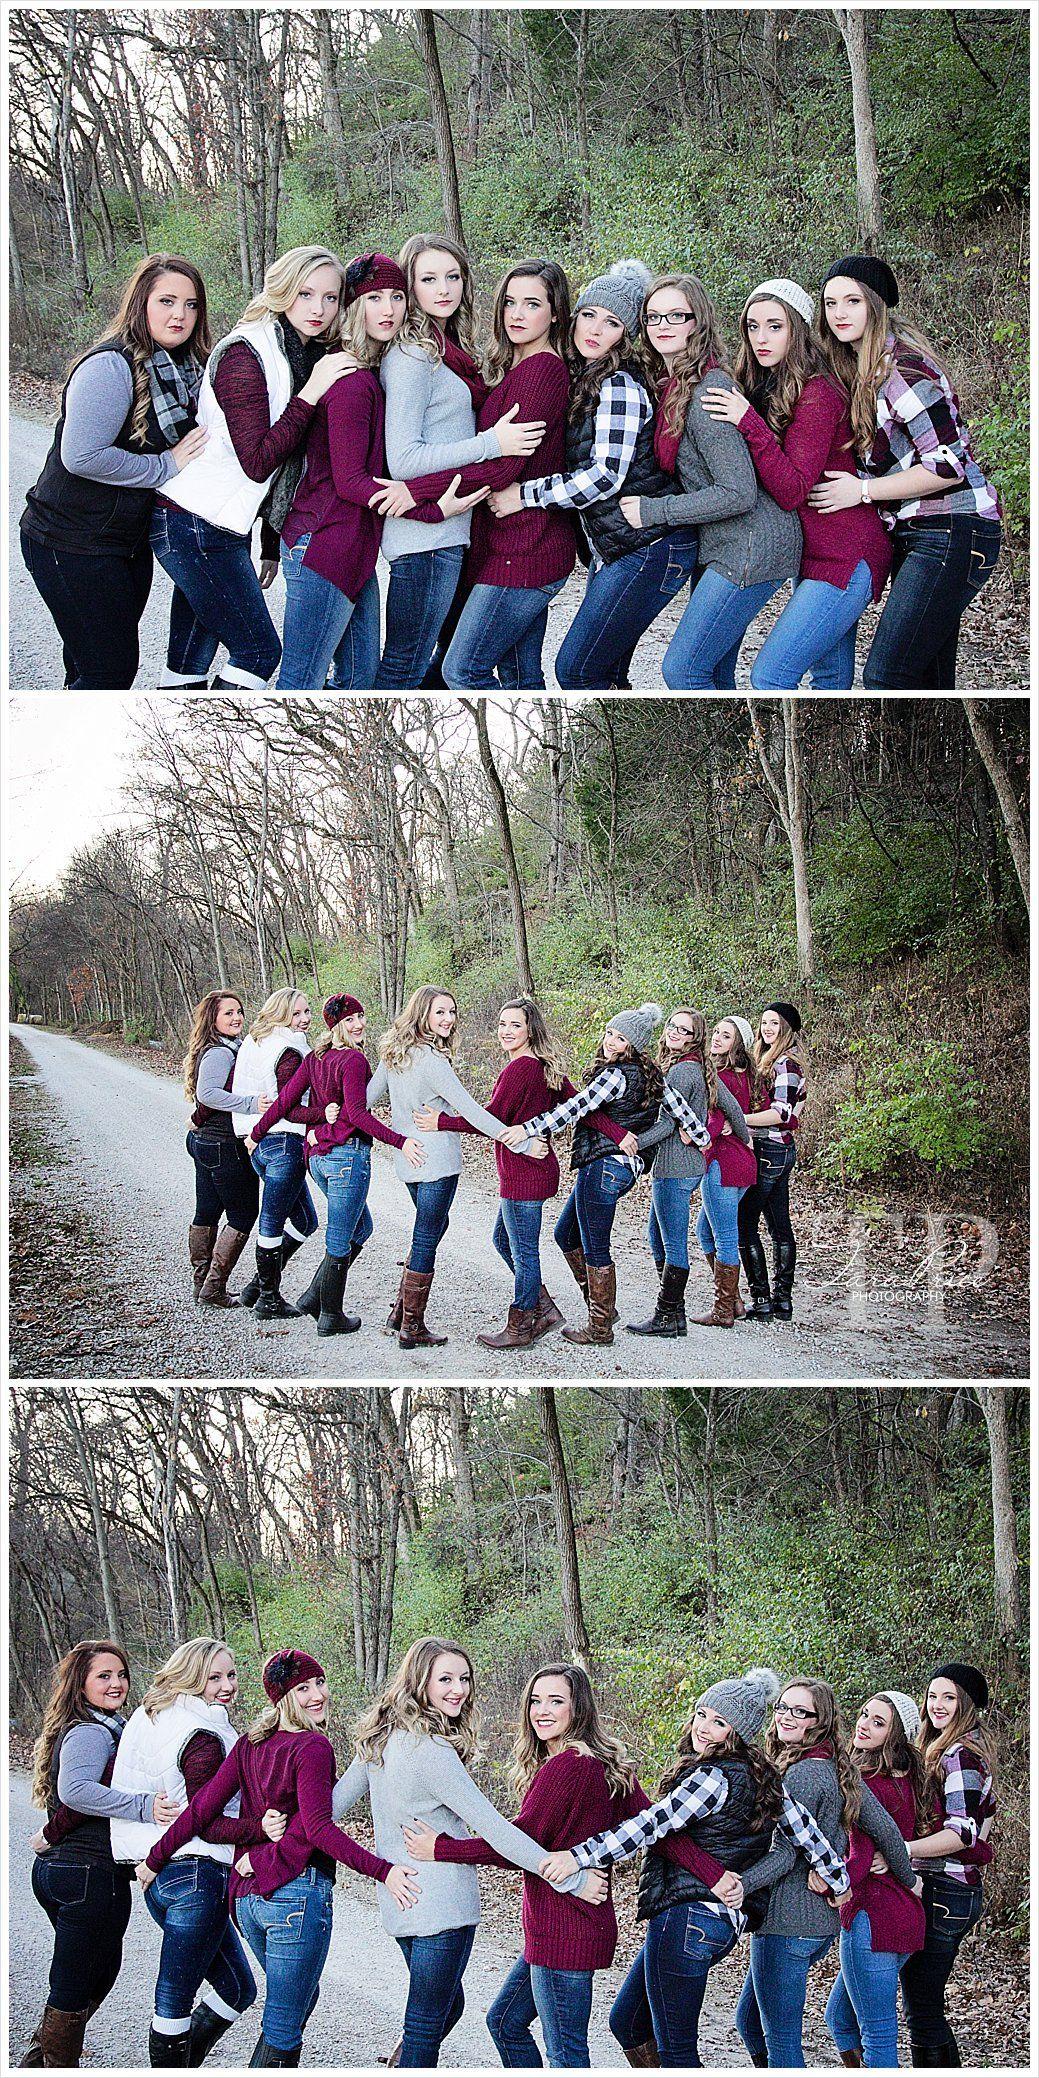 TPP Senior Models Fall Fun with Horses in Festus Mo. #familyphotooutfits